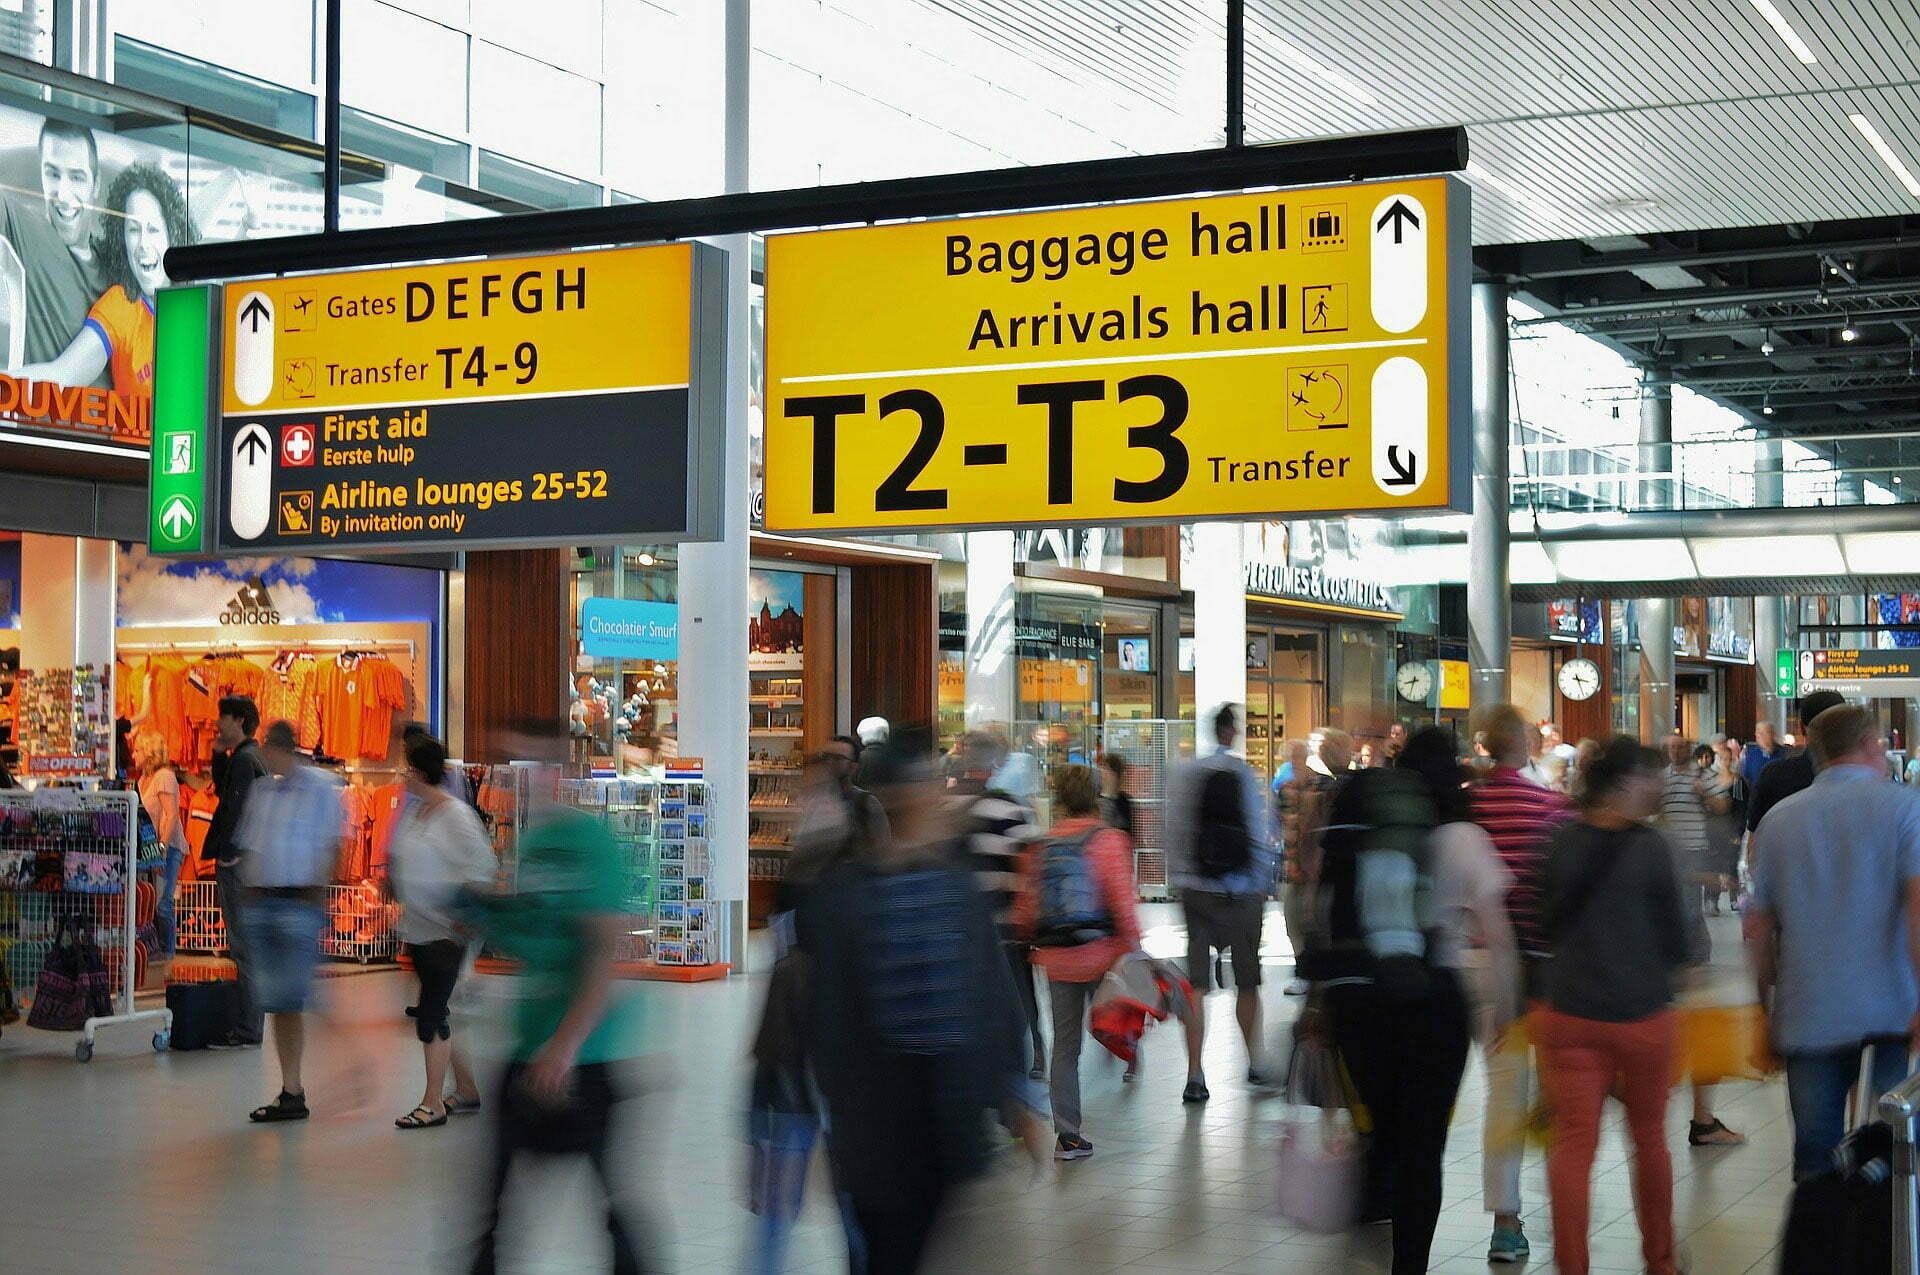 airport2airport